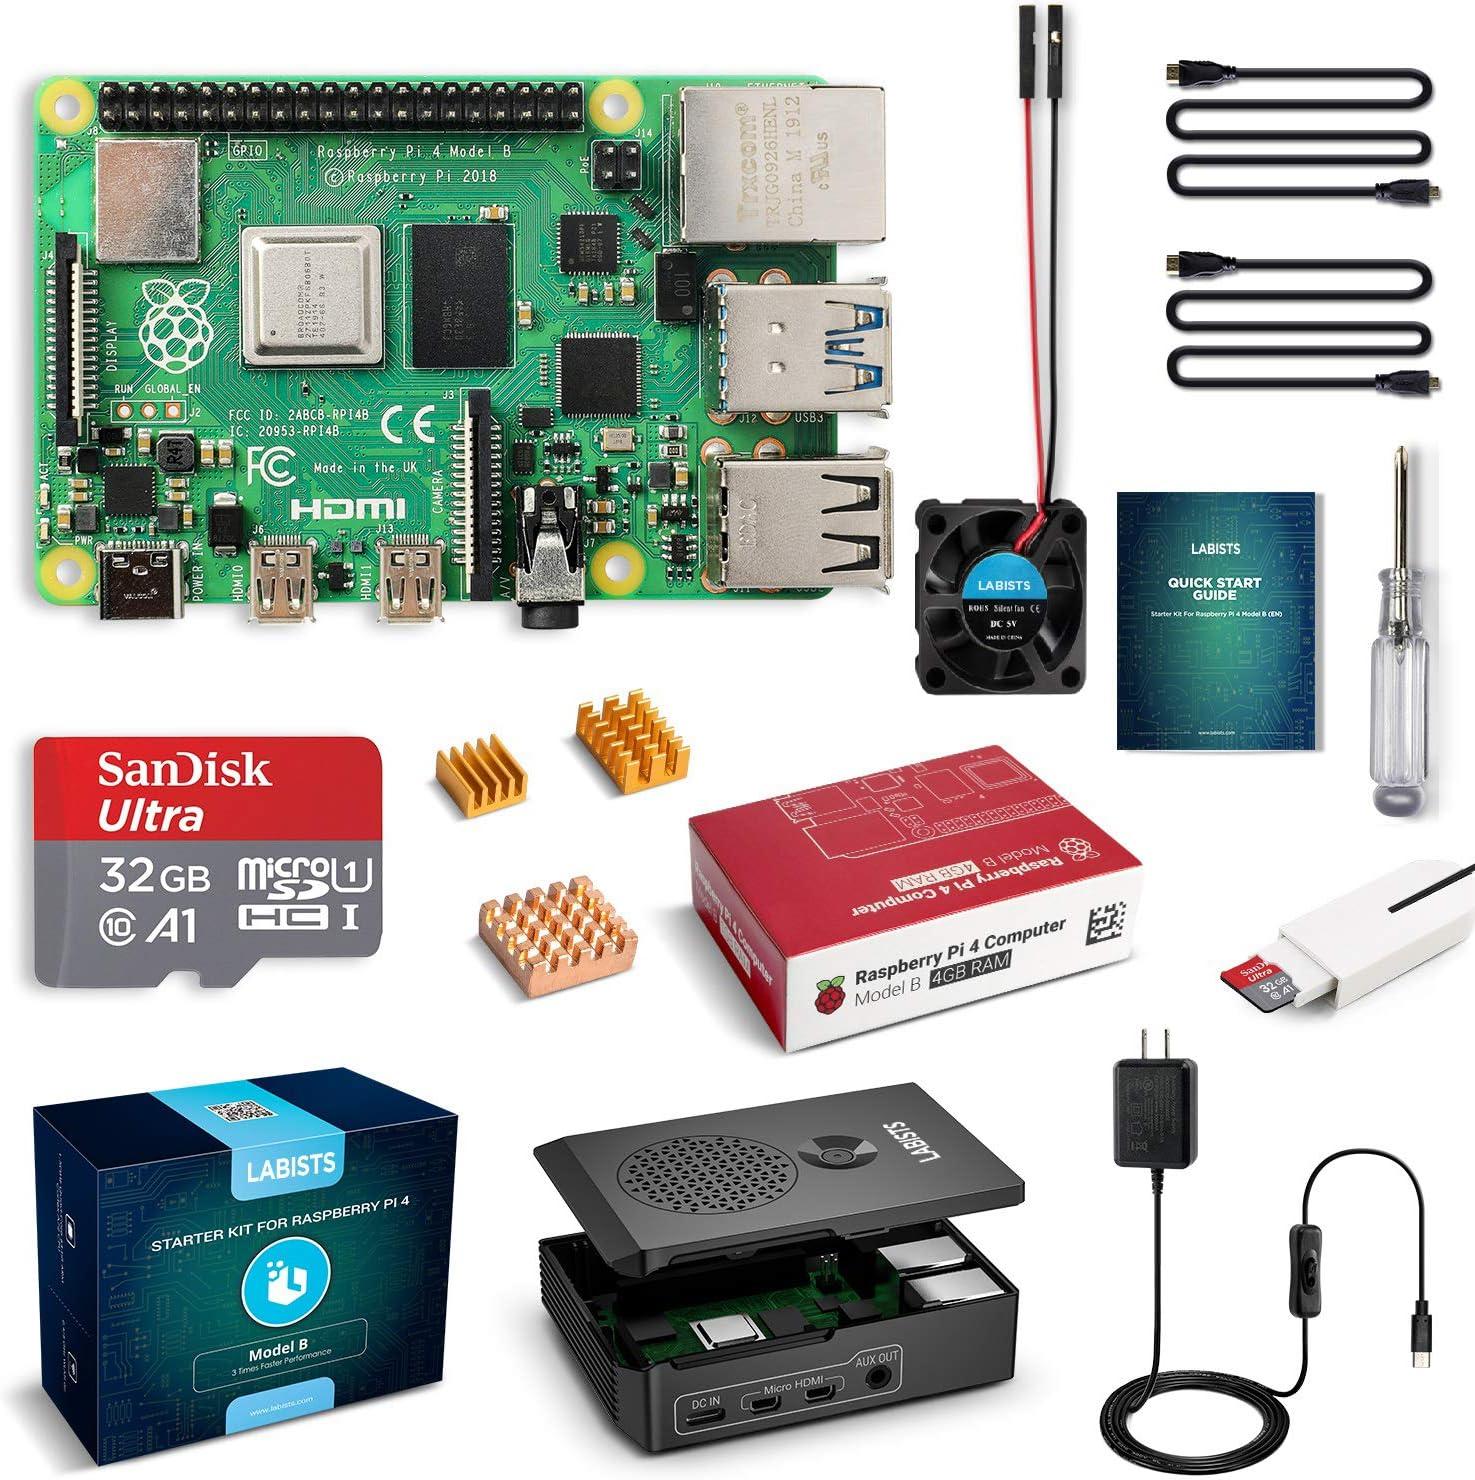 LABISTS Raspberry Pi 4 4GB Starter Kit with 32GB Micro SD Card Preloaded Noobs, Black Case, Heatsink Fan, Micro HDMI Cable x 2, SD Card Reader (4GB RAM)